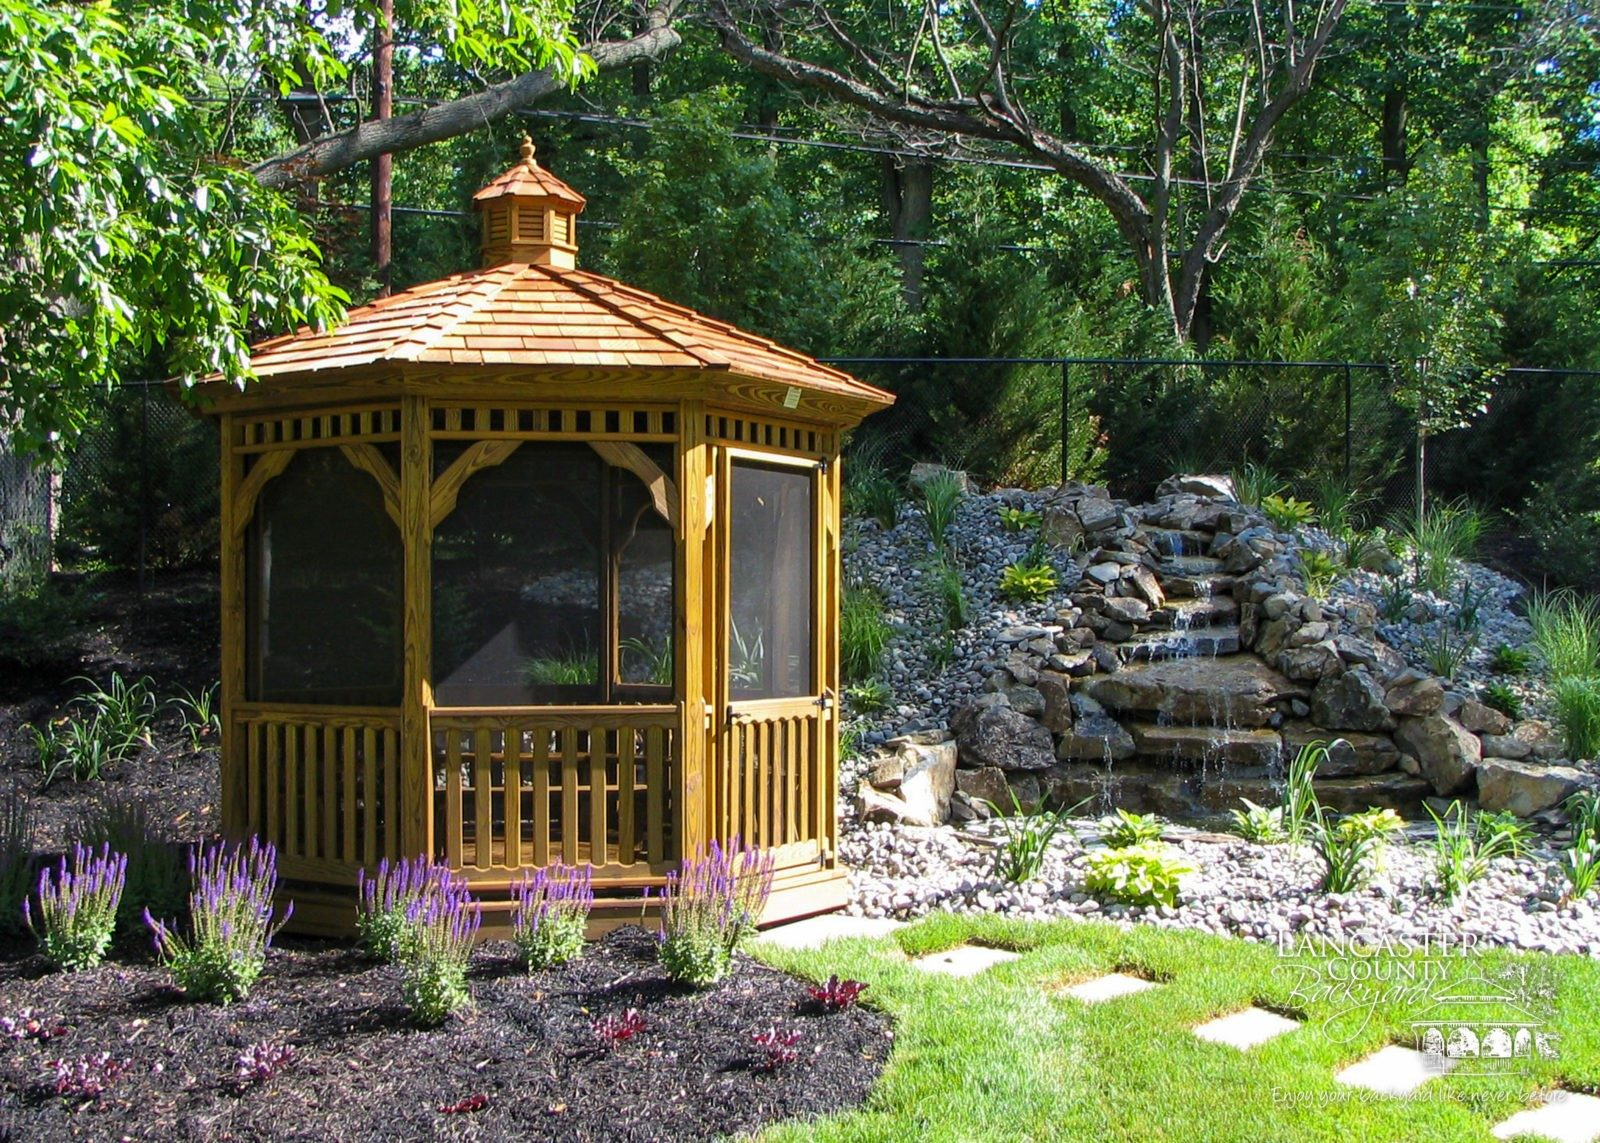 A Permanent Irresistible Wooden Gazebo At The Backyard